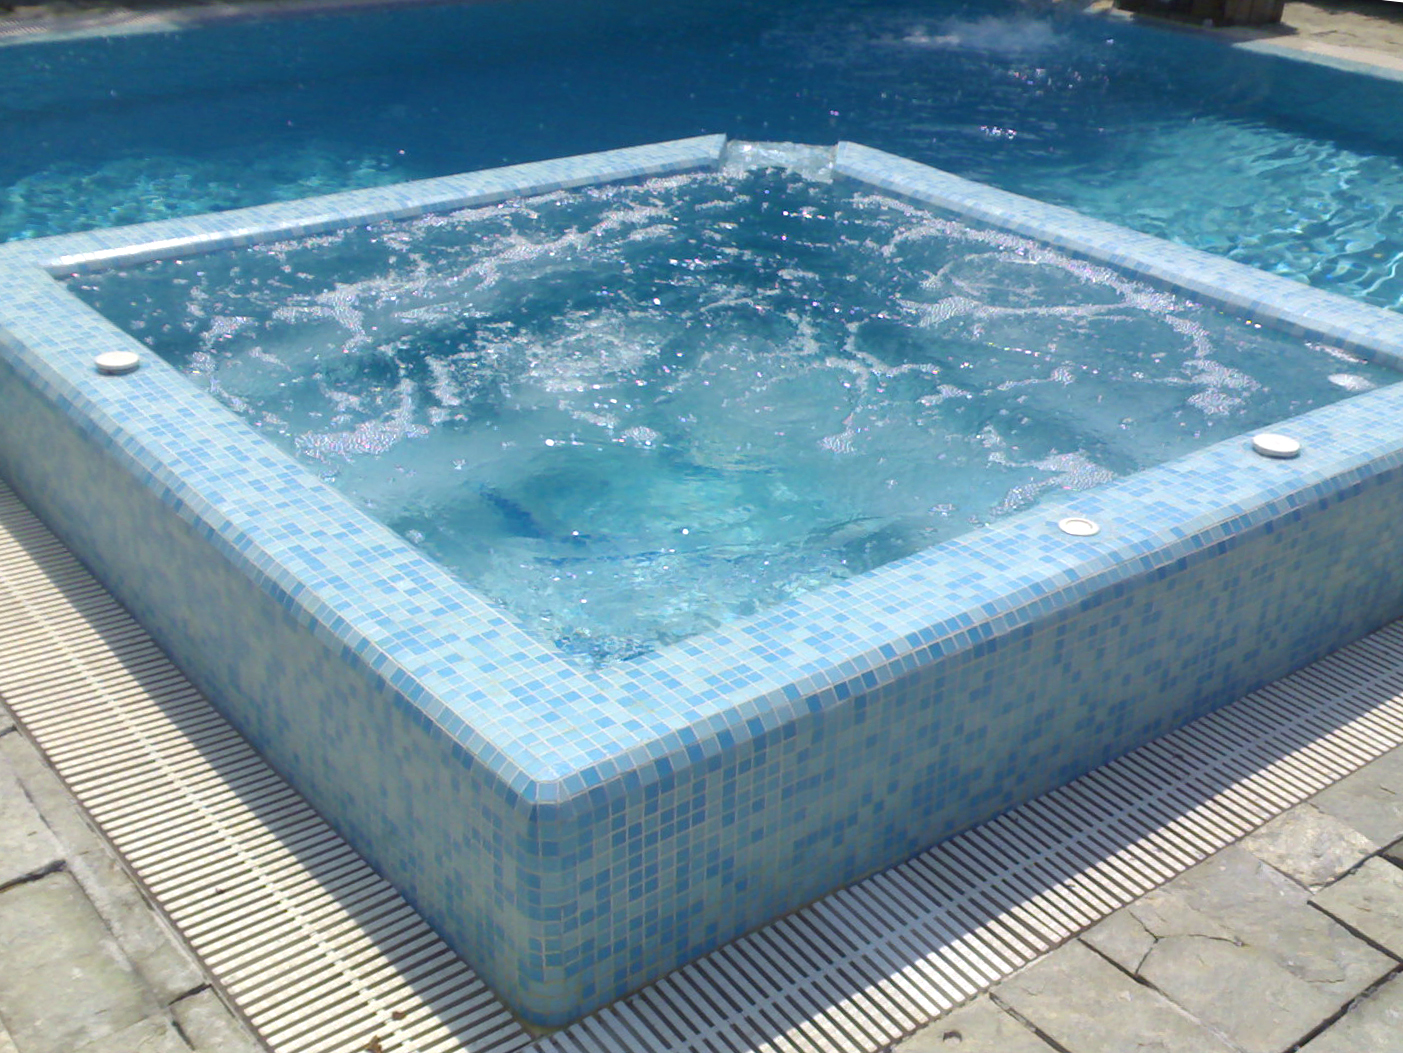 Piscine saune e vasche idromassaggio perpool - Vasca idro da esterno ...